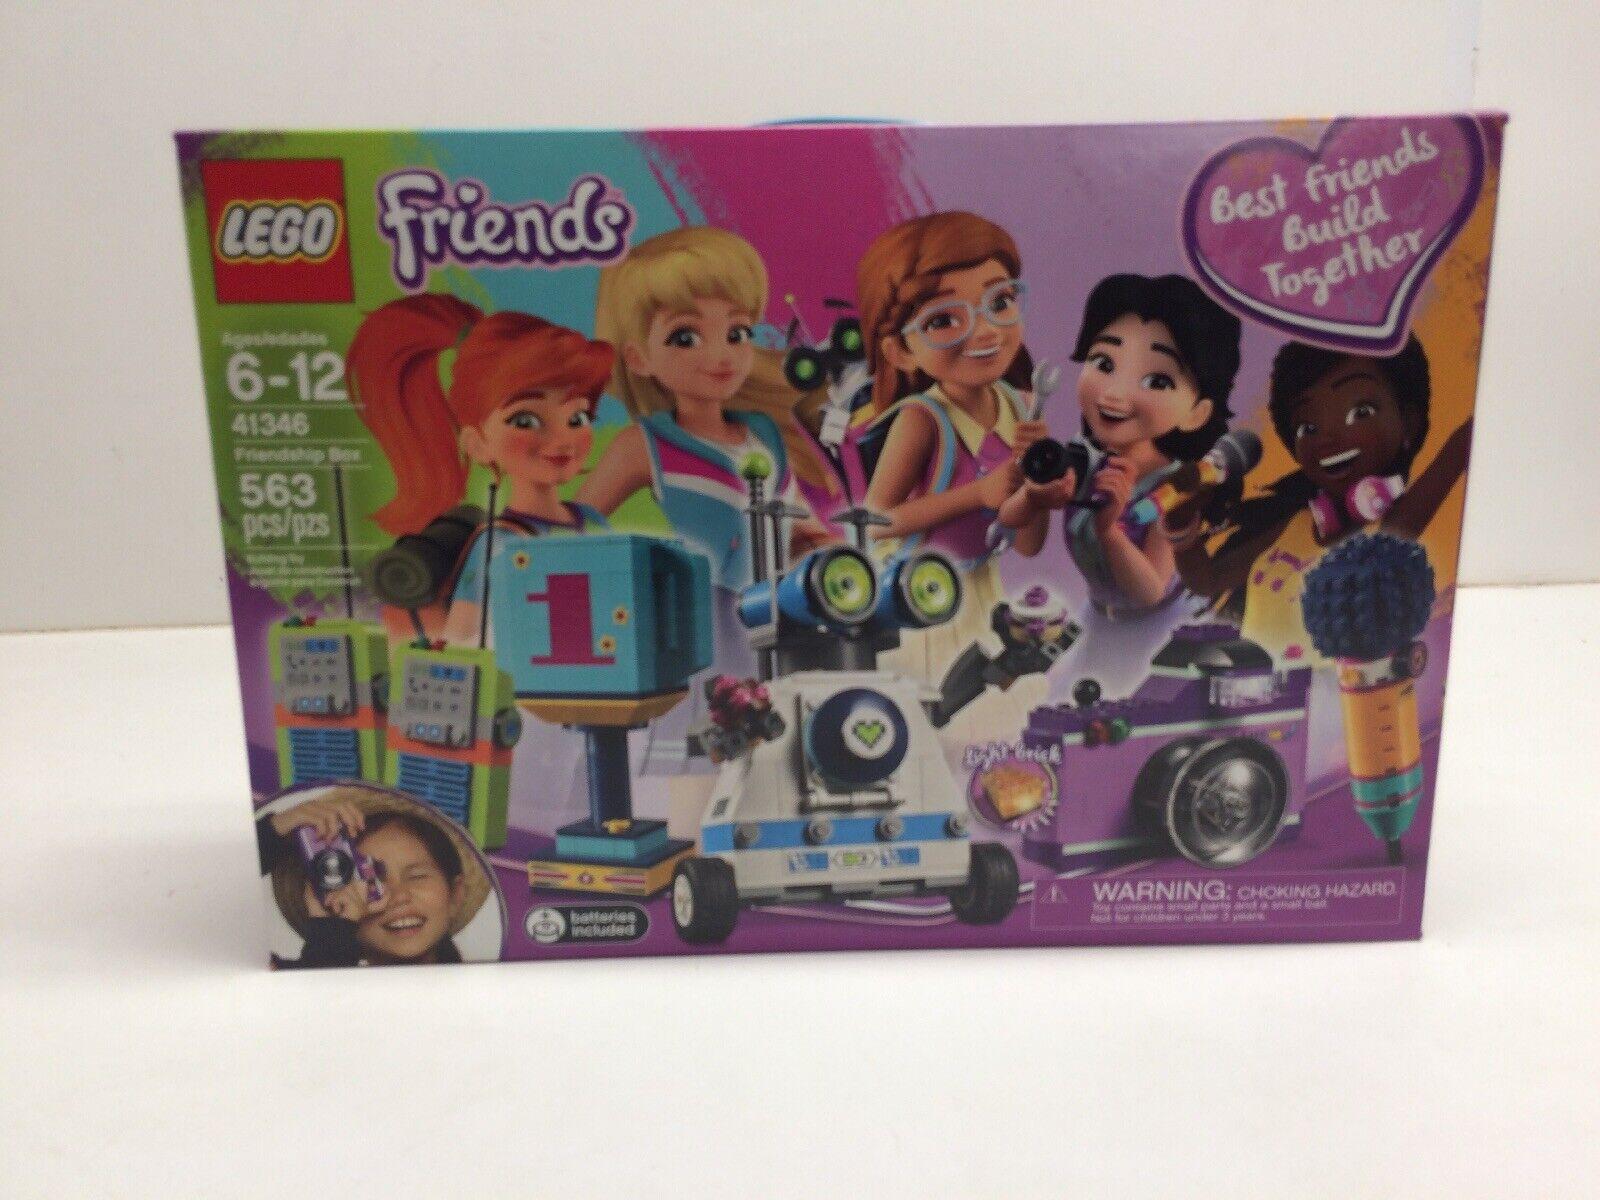 LEGO Friends  Friendship Box Building Play Set 41346